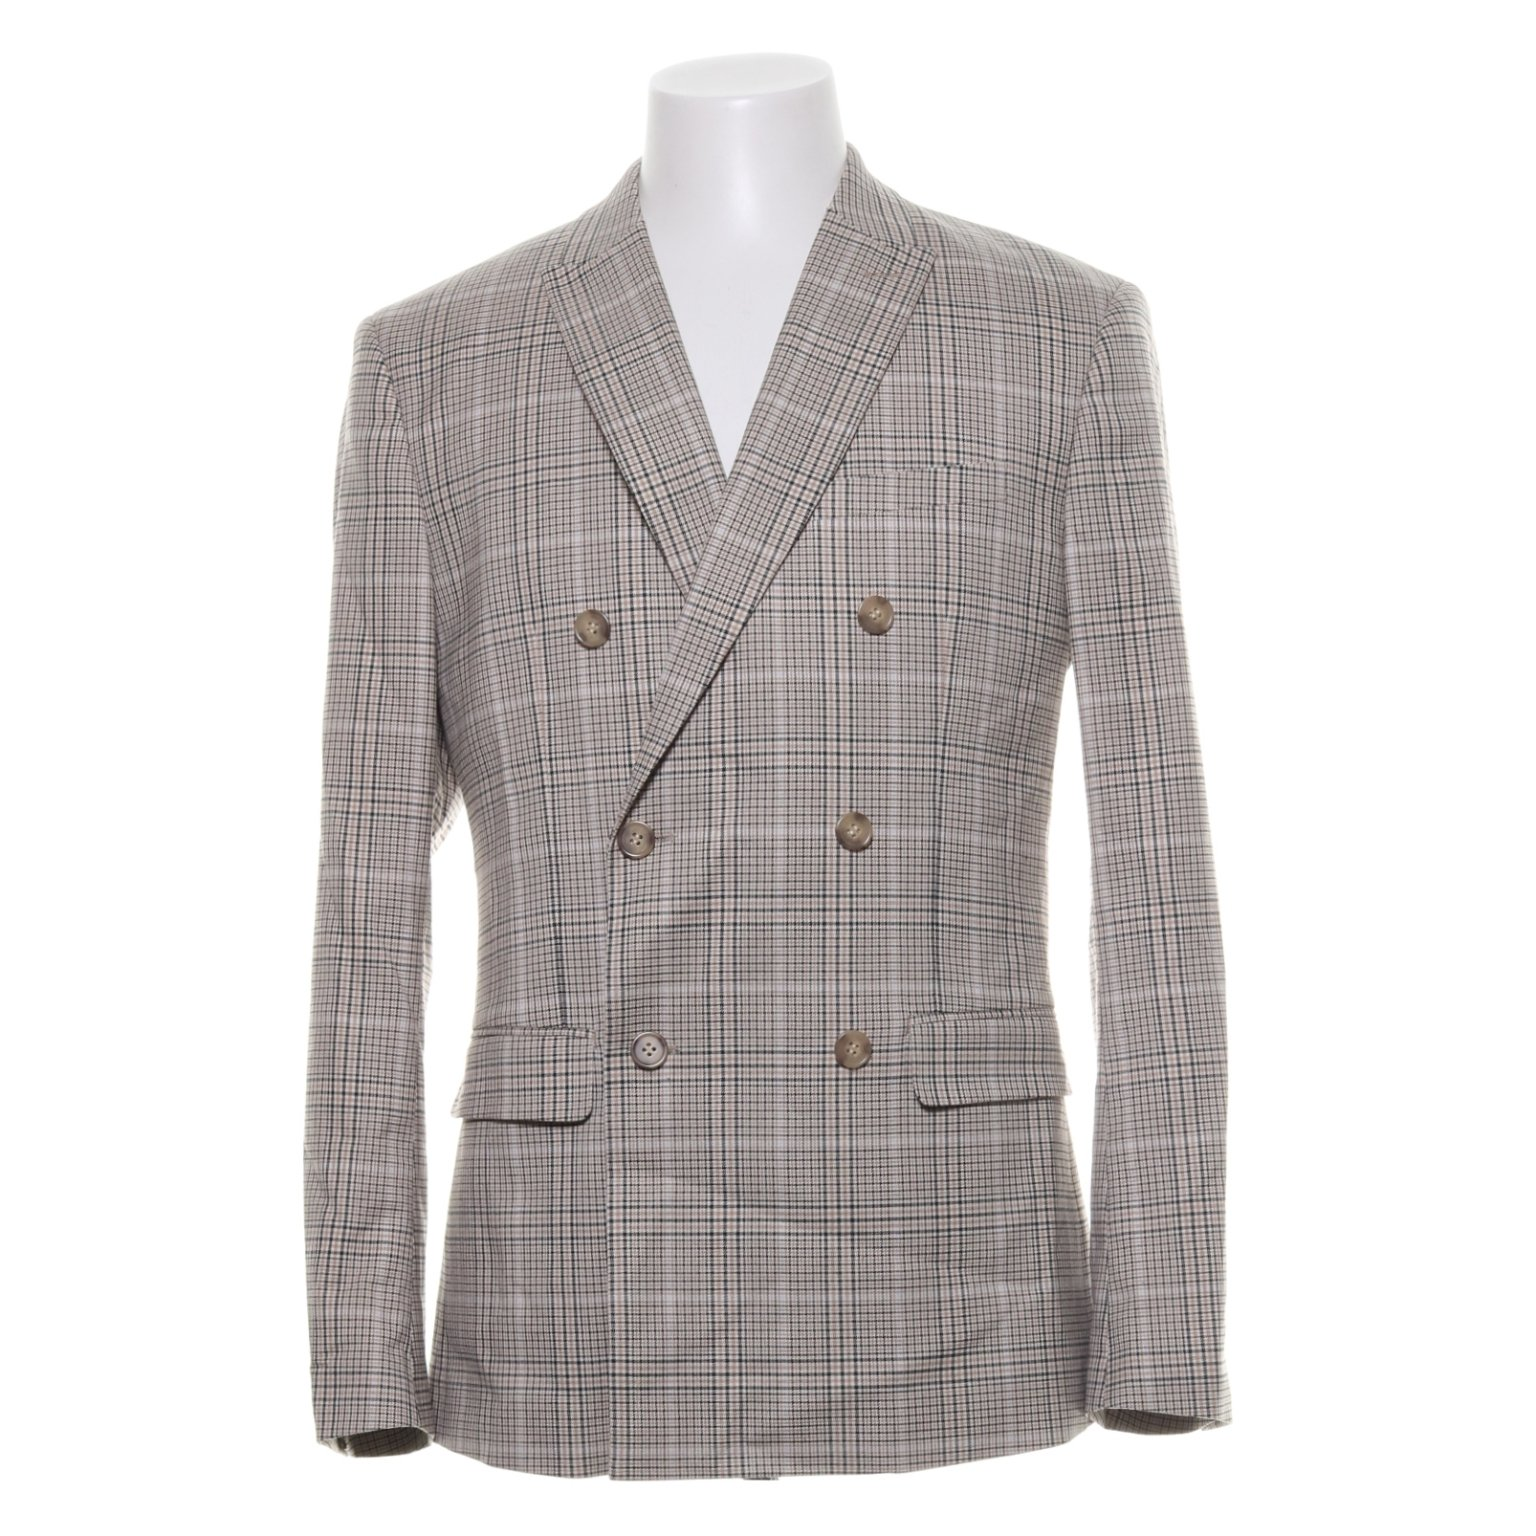 H&M Trend, Kavaj, Strl: M, Slim Fit, Beig.. (419534290) ᐈ